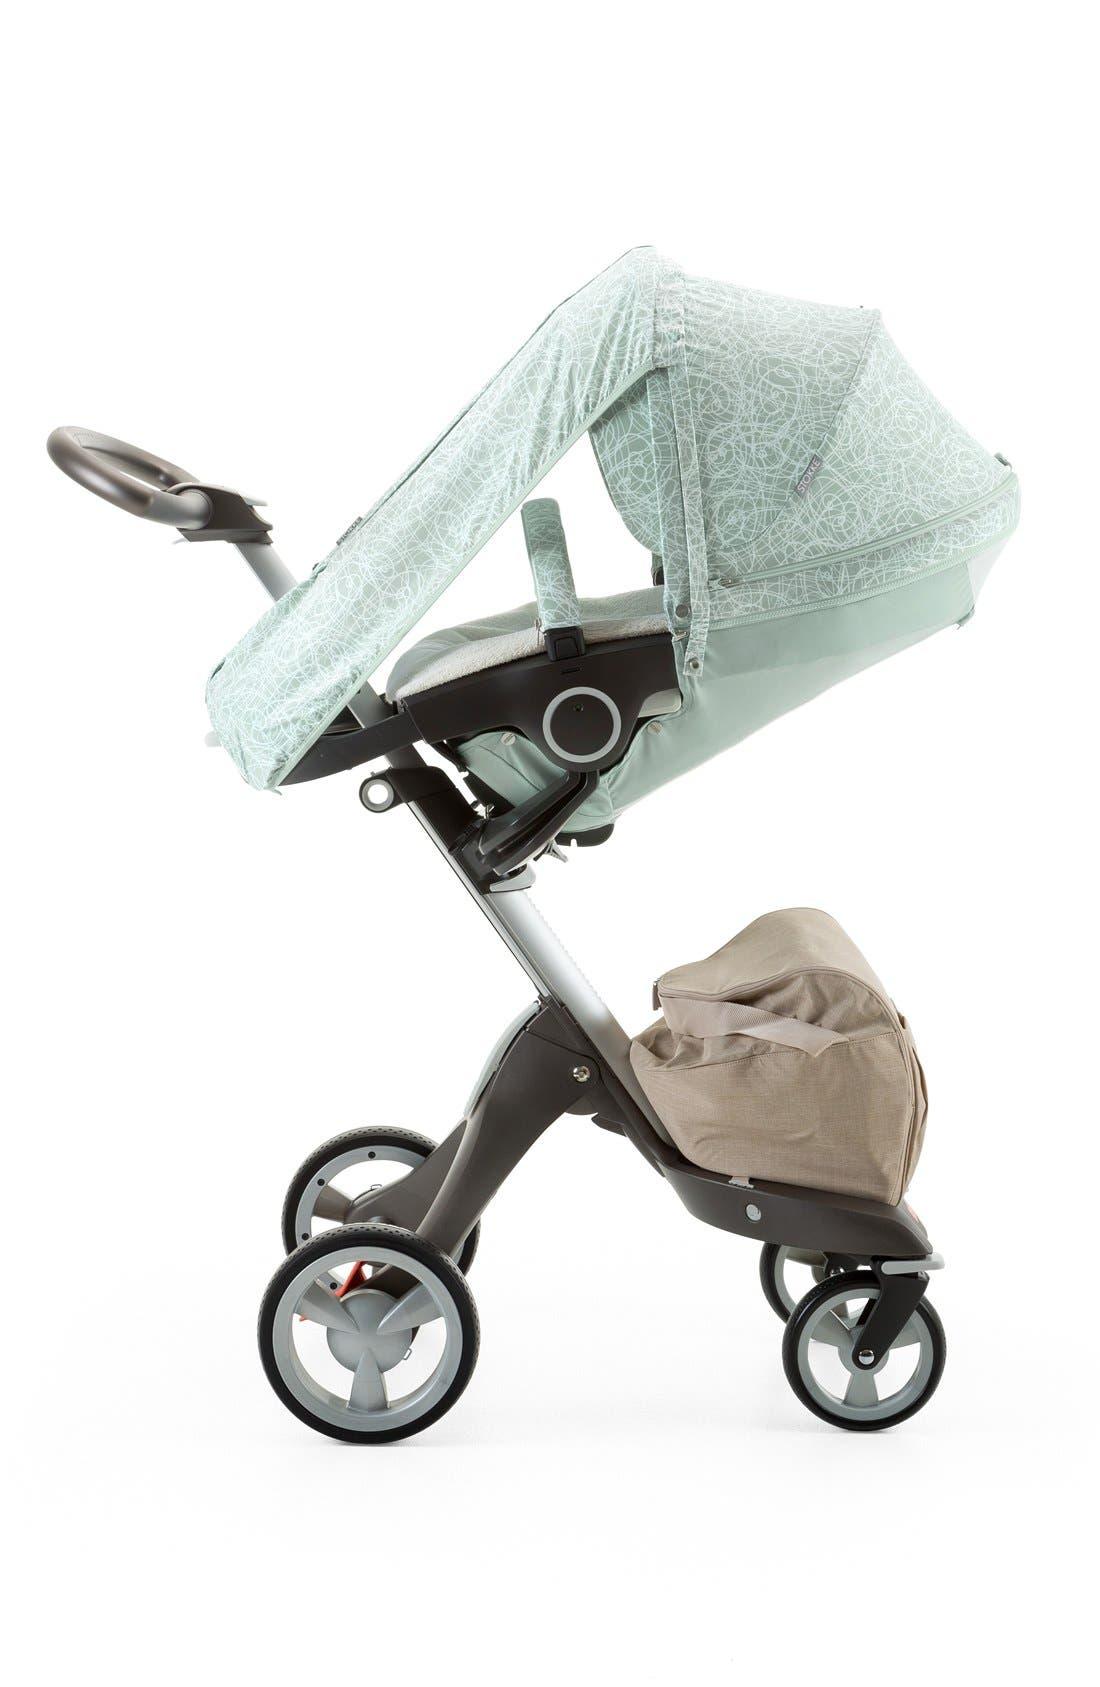 Baby 'Xplory<sup>®</sup> Stroller Summer Kit' Shade Set,                             Main thumbnail 1, color,                             Salty Blue